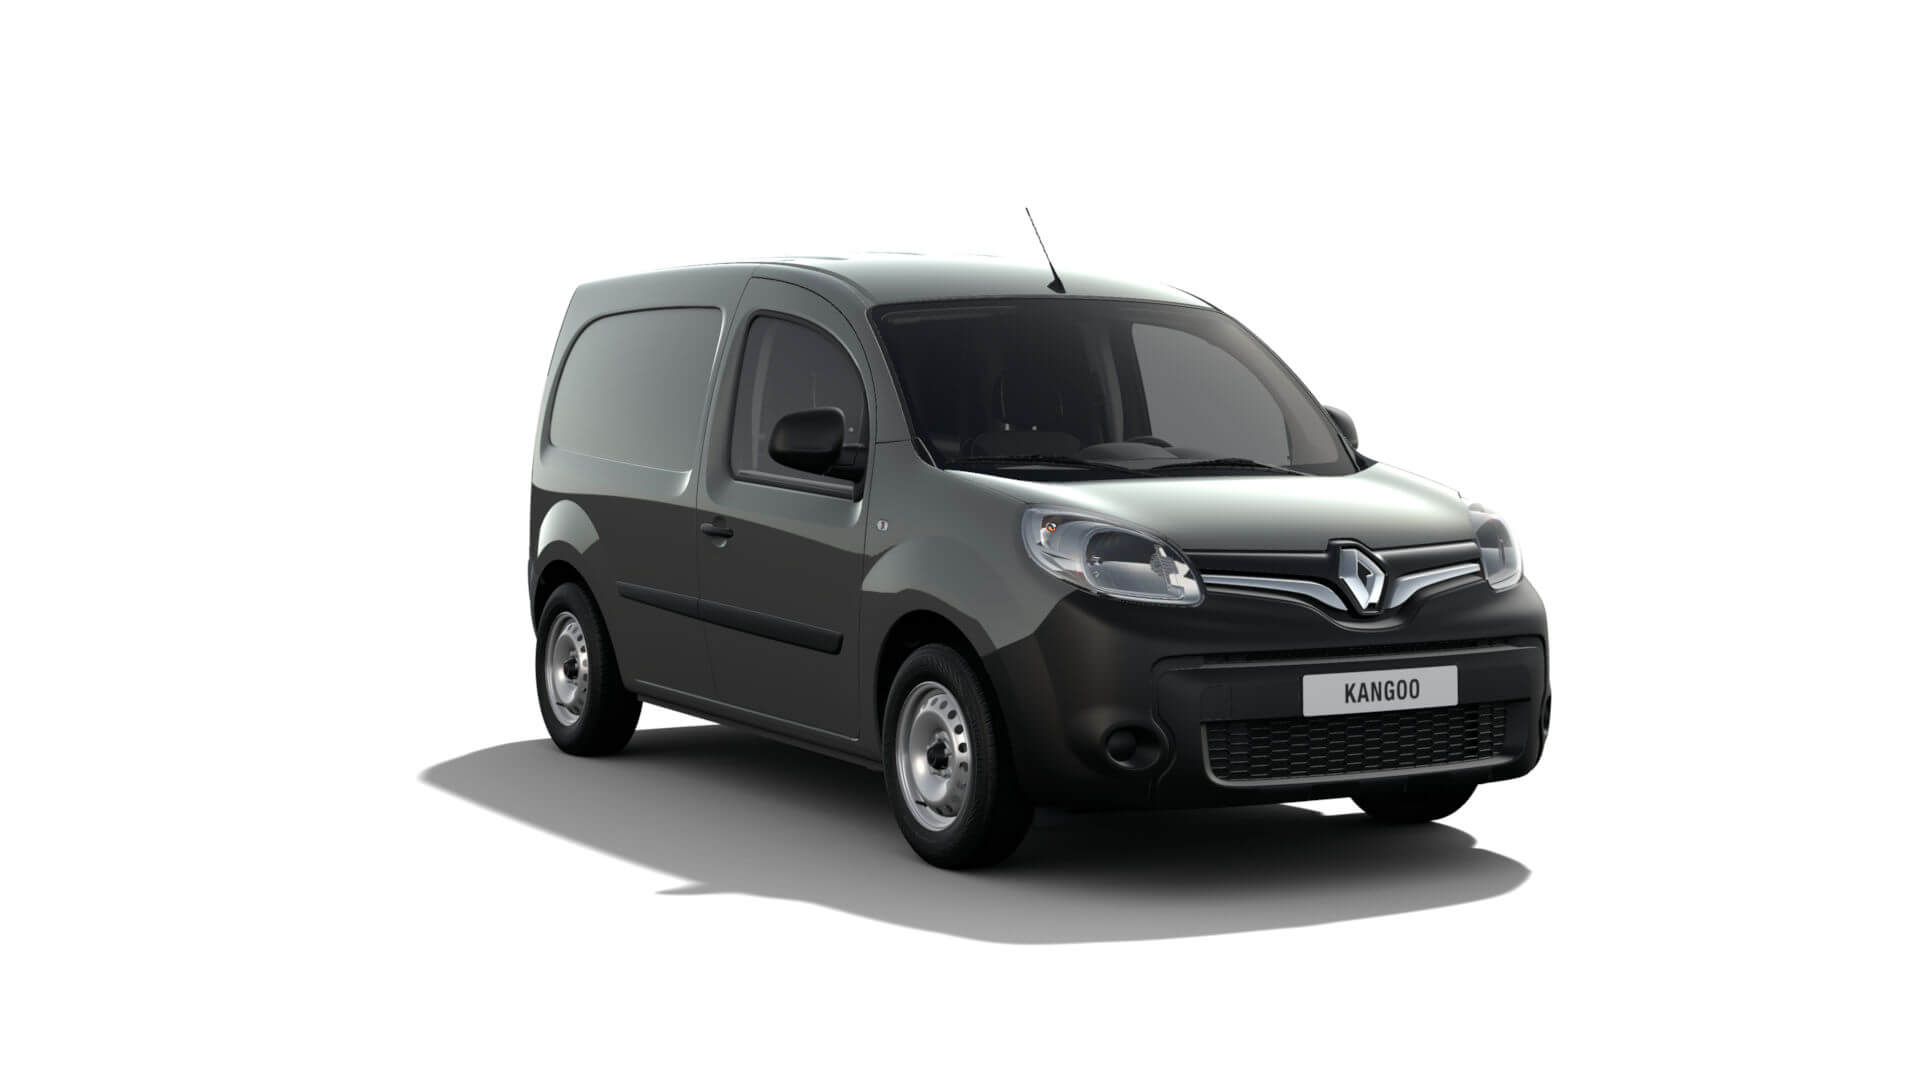 Automodell Anthrazit - Renault Kangoo NFZ - Renault Ahrens Hannover